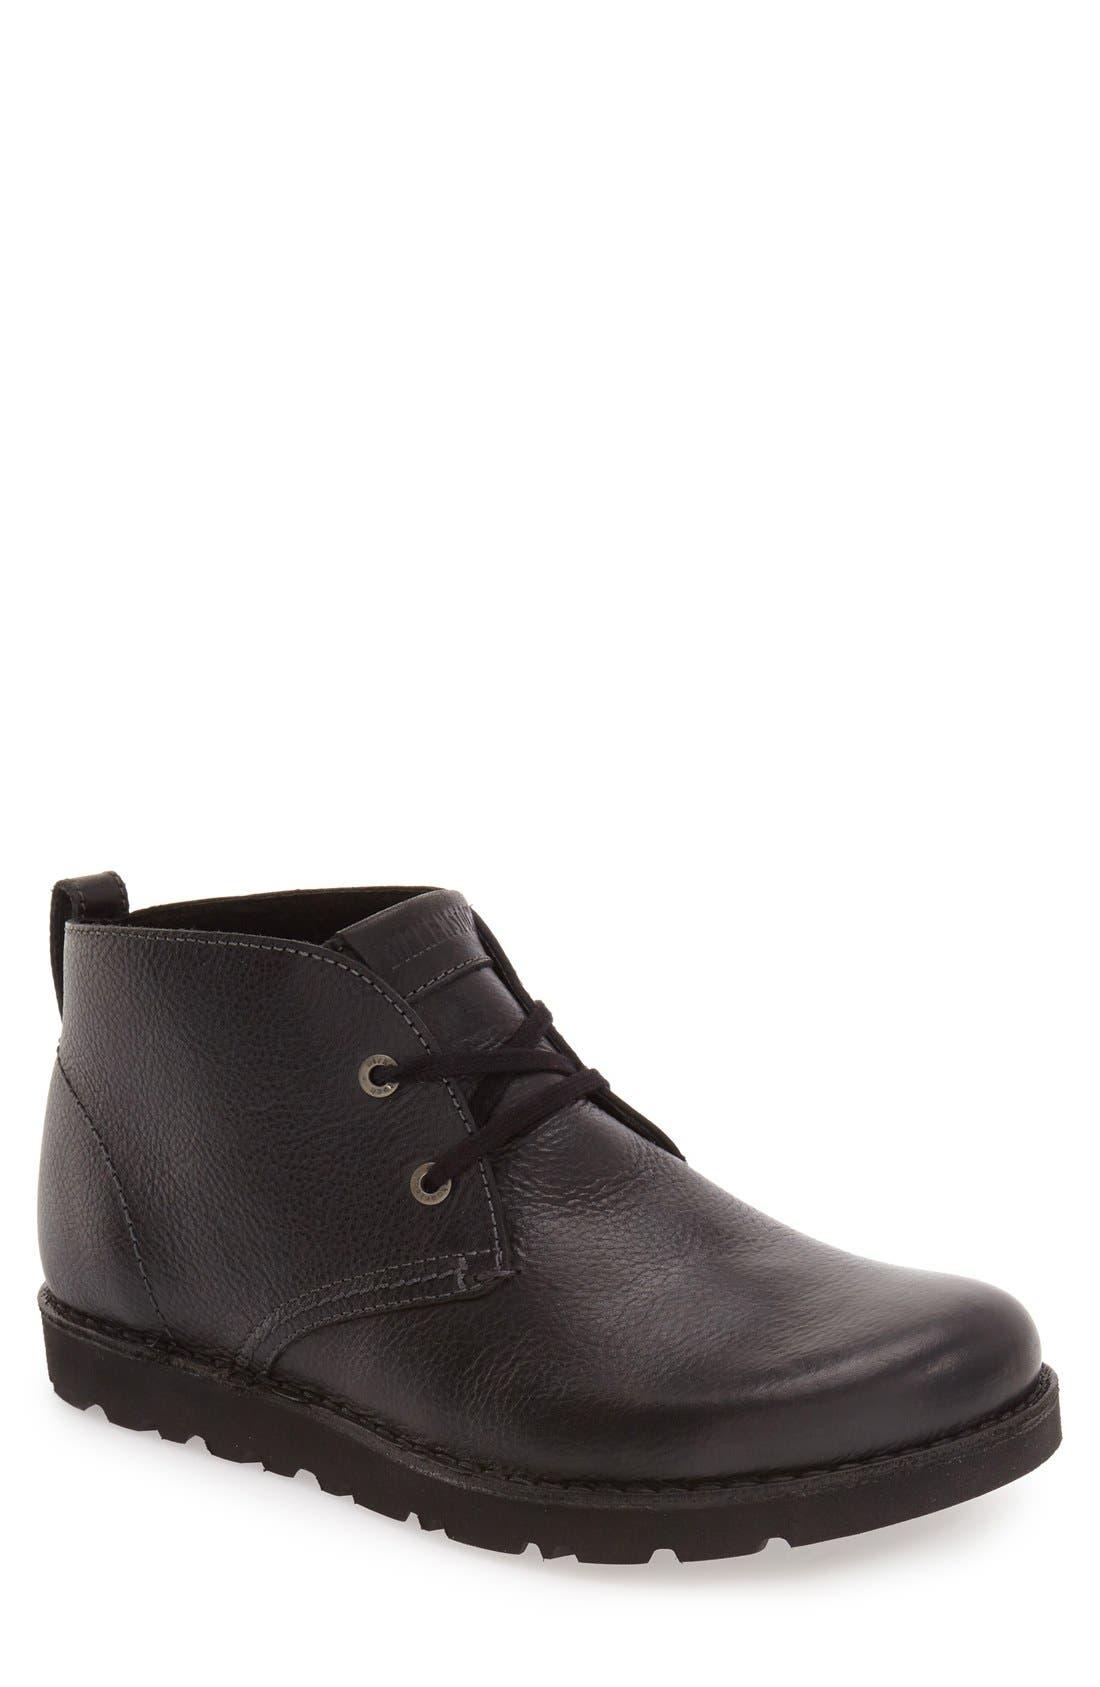 'Harris' Chukka Boot,                         Main,                         color, 001